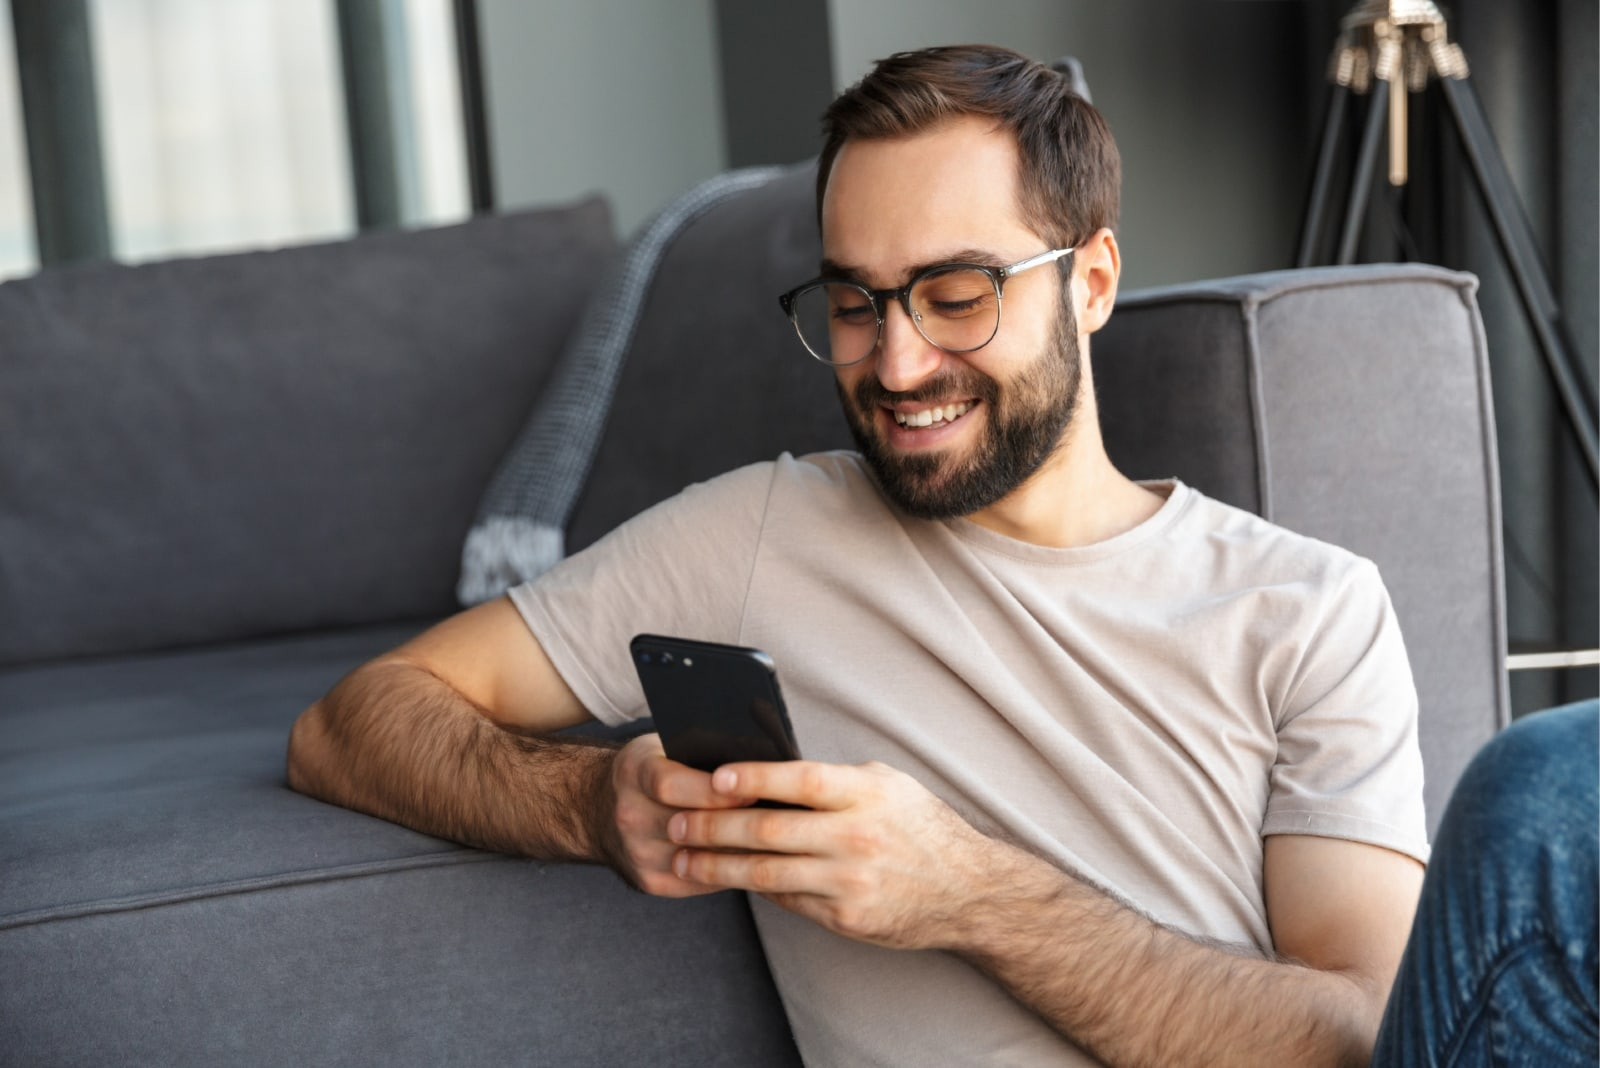 happy man using phone while sitting near sofa